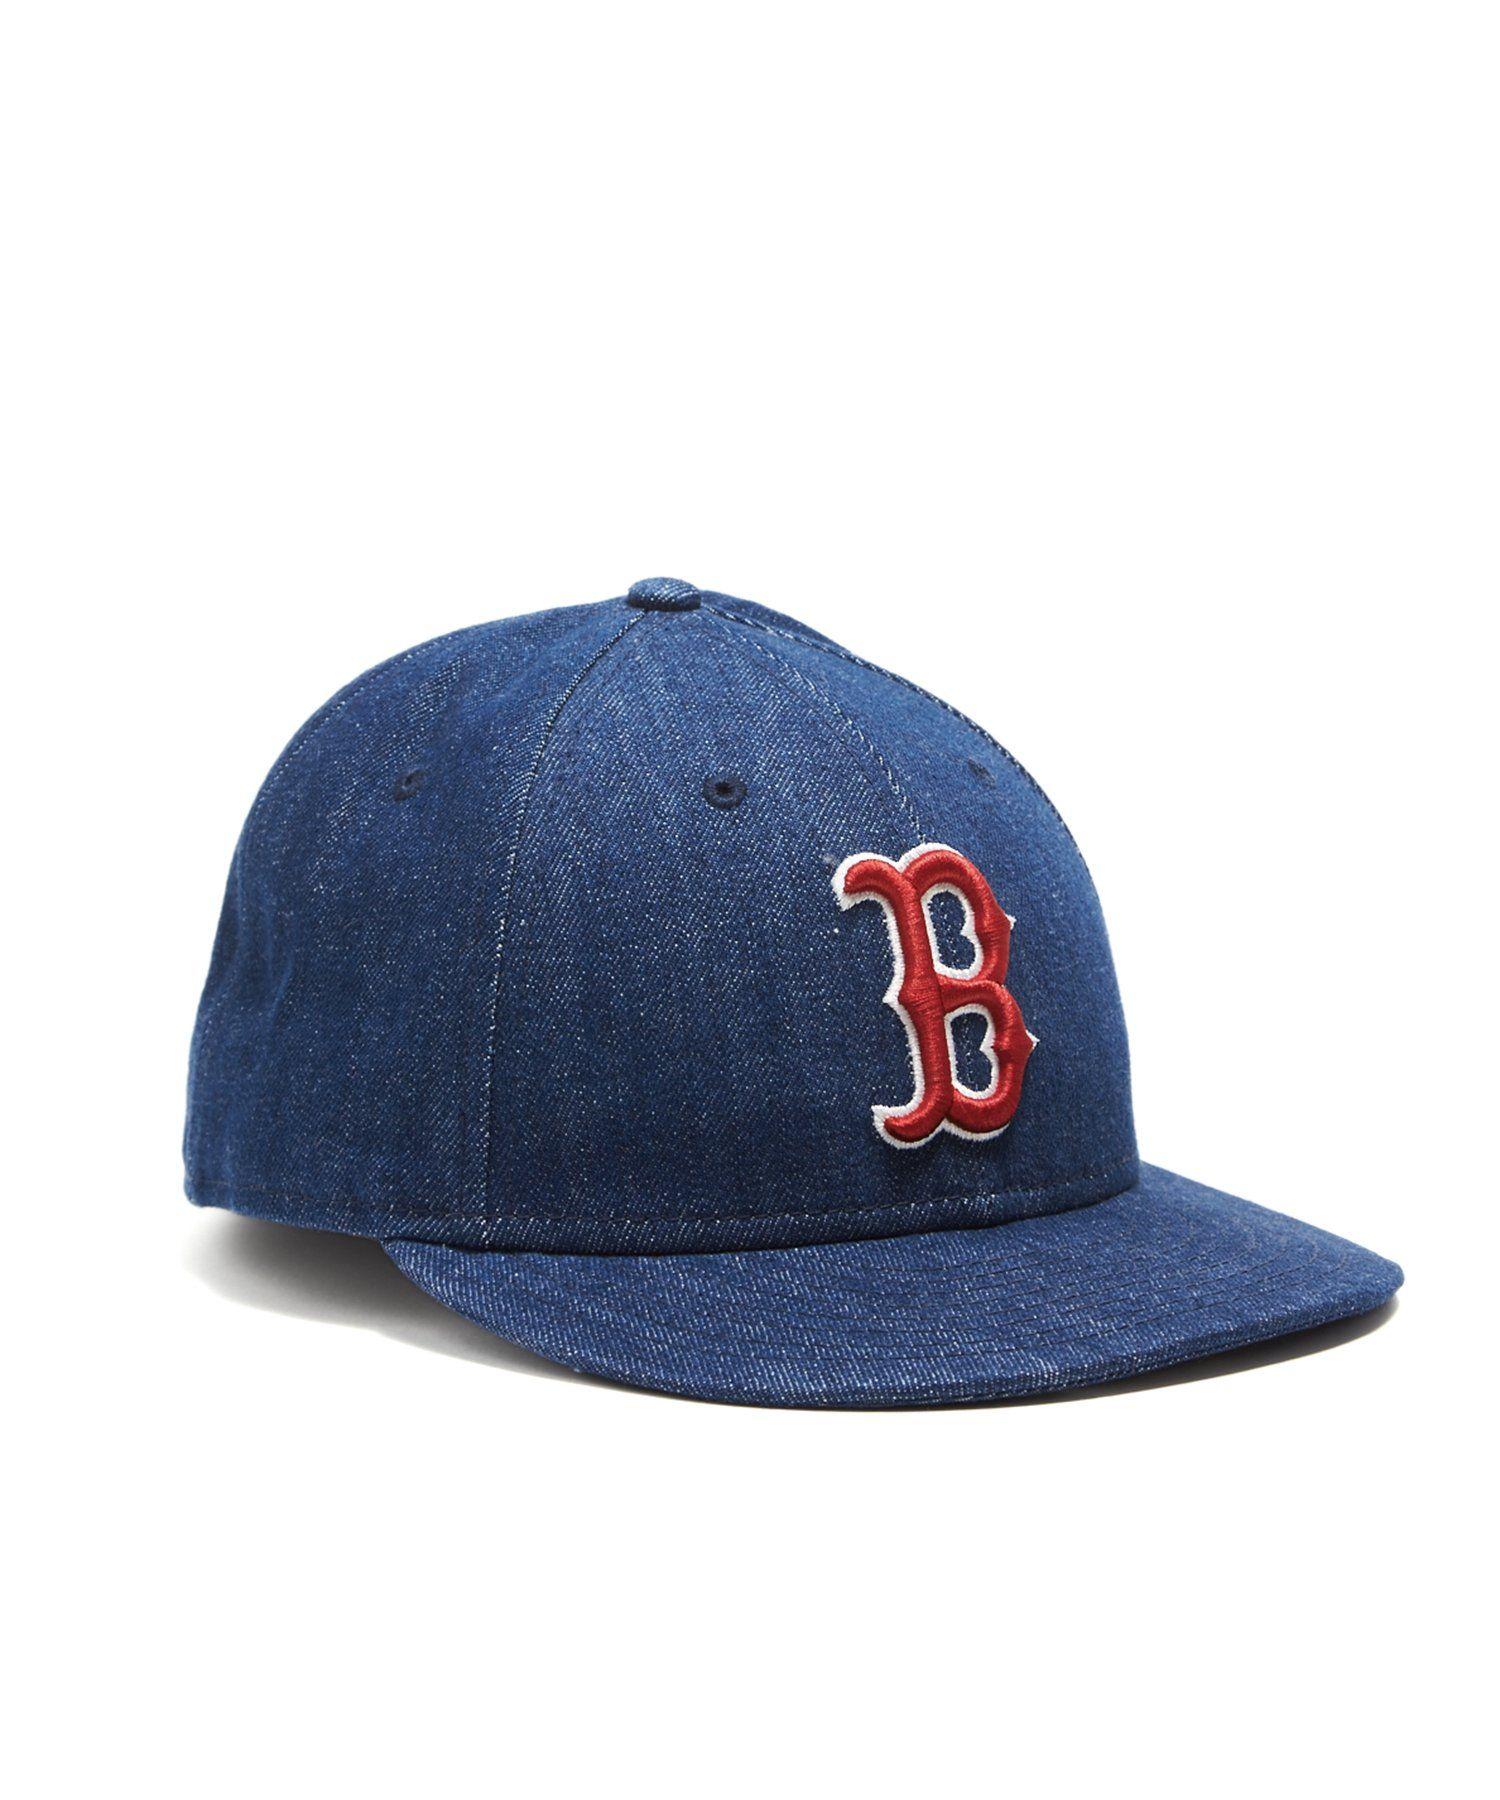 Todd Snyder New Era Cone Denim Boston Red Sox Cap Red Sox Cap